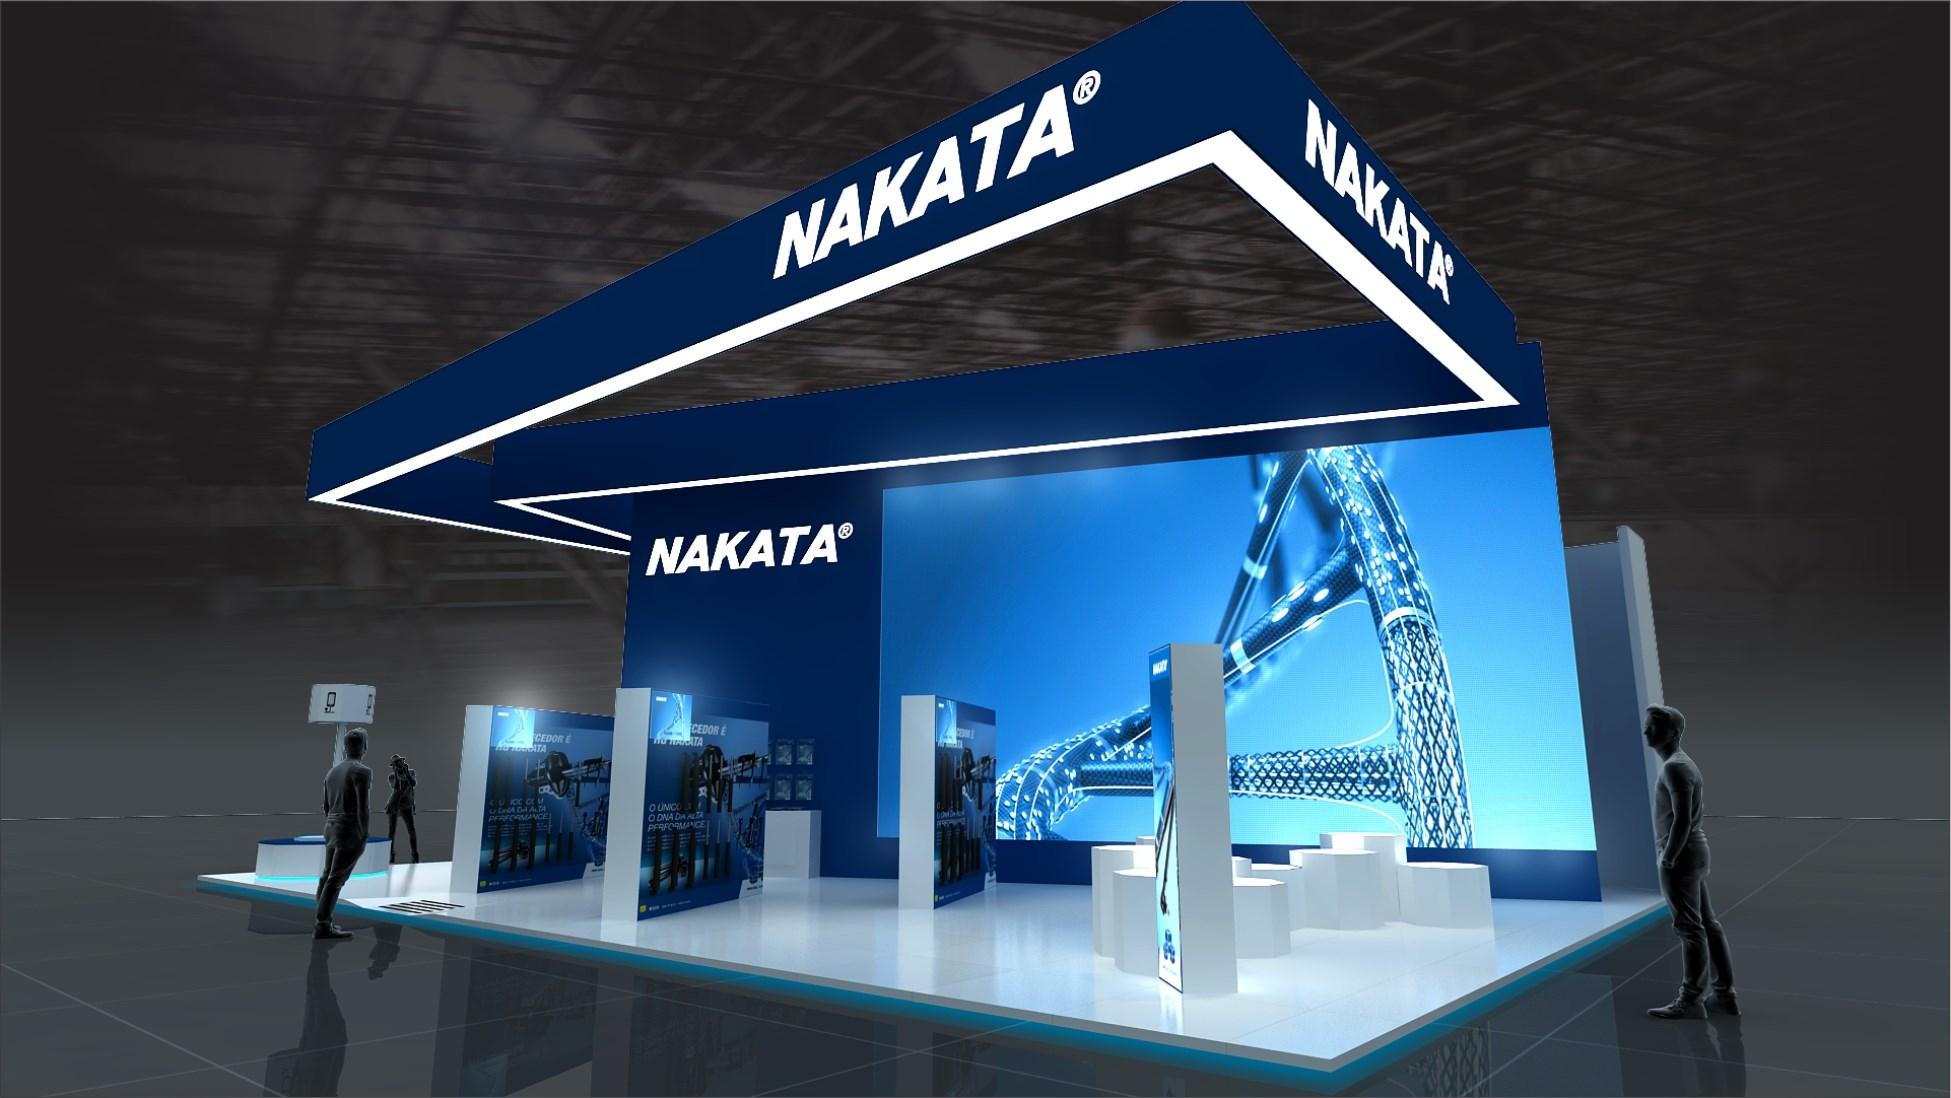 Azul Nakata ganha destaque no estande da Automec 2017